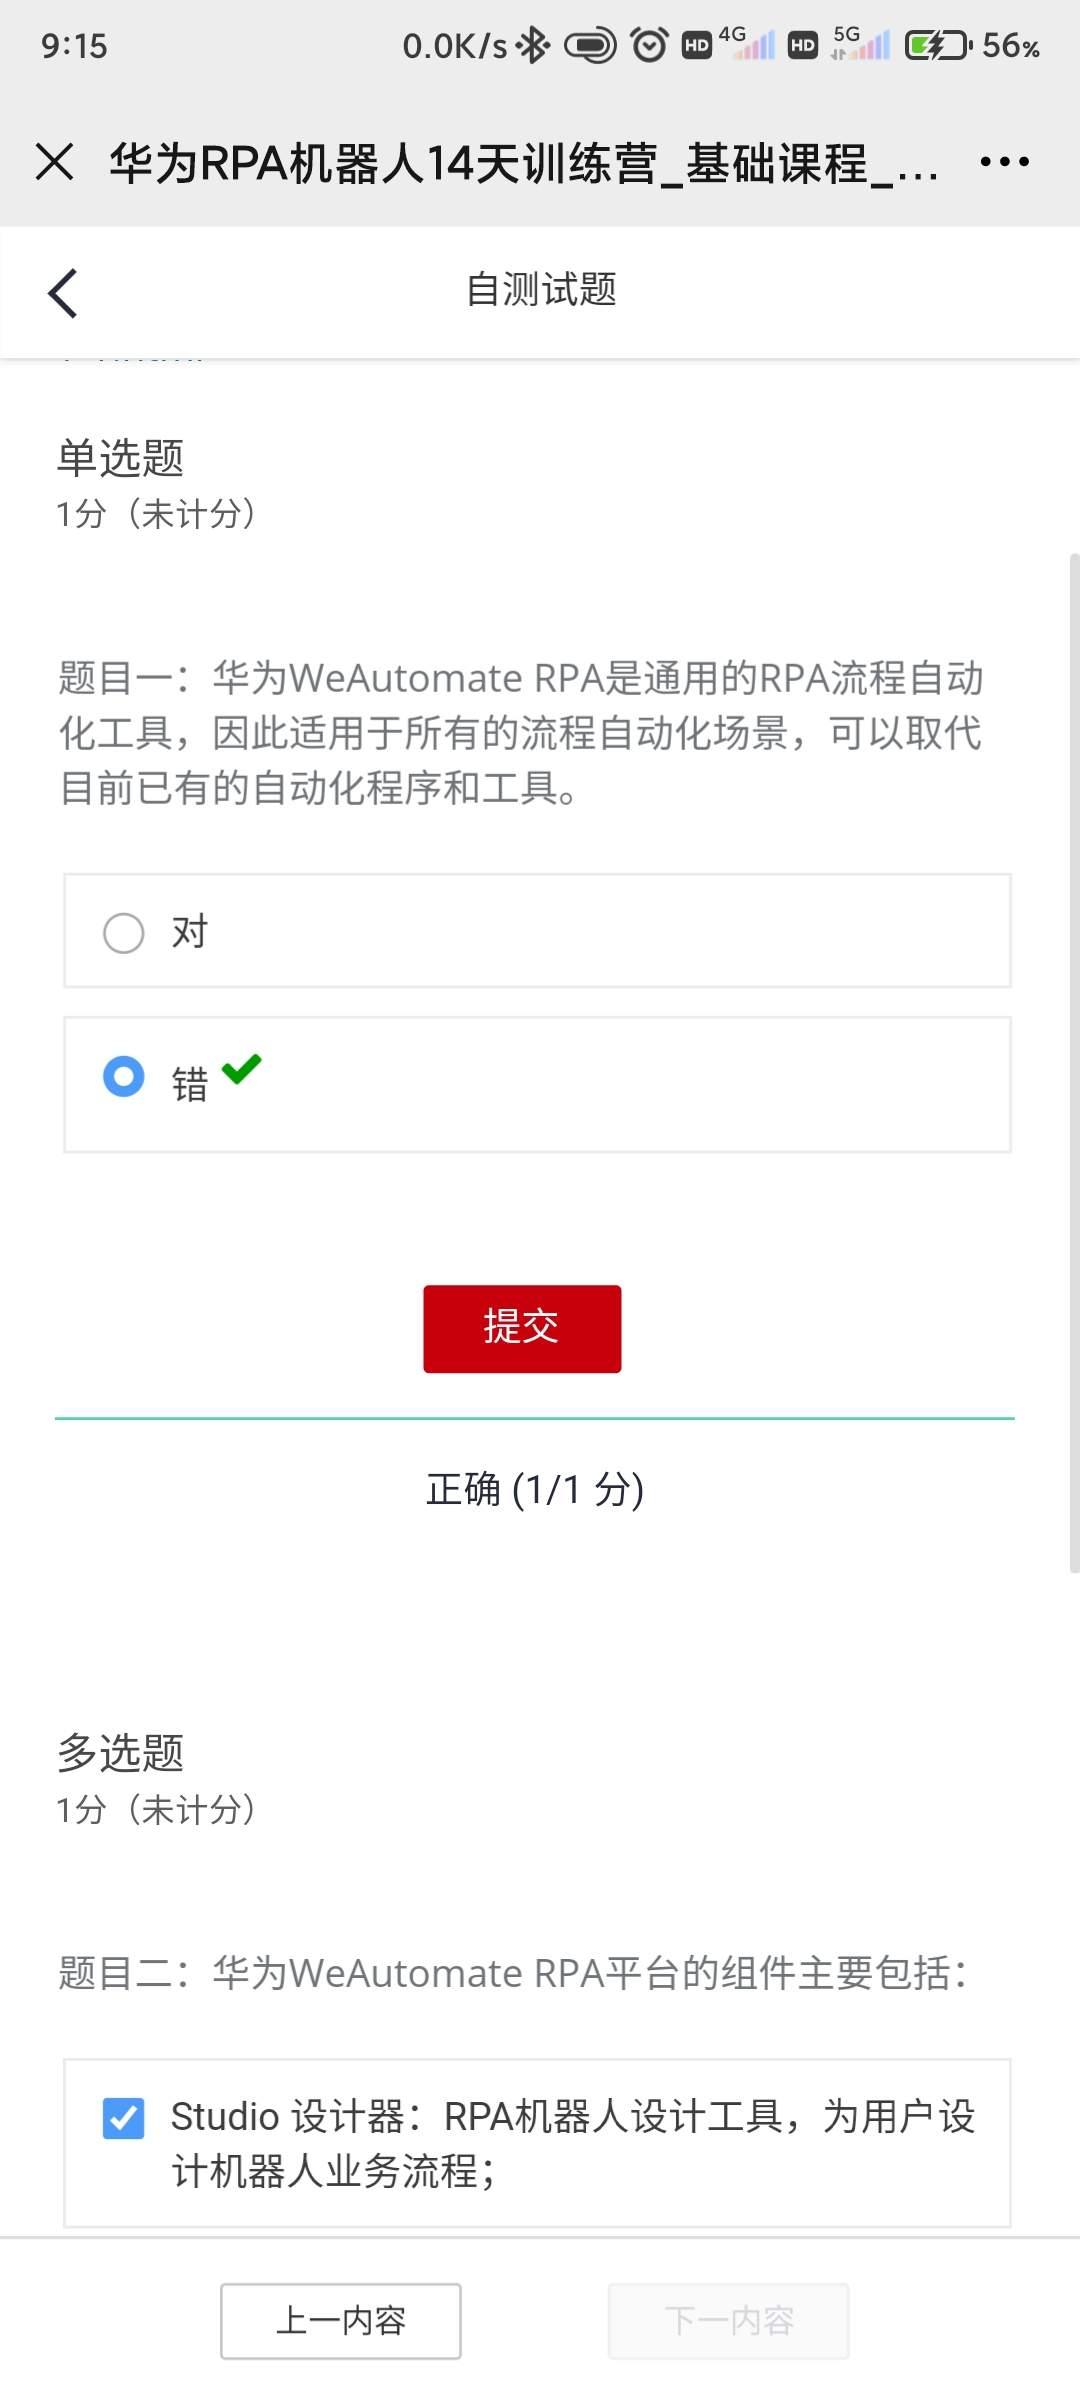 Screenshot_2021-07-05-09-15-03-504_com.tencent.mm.jpg